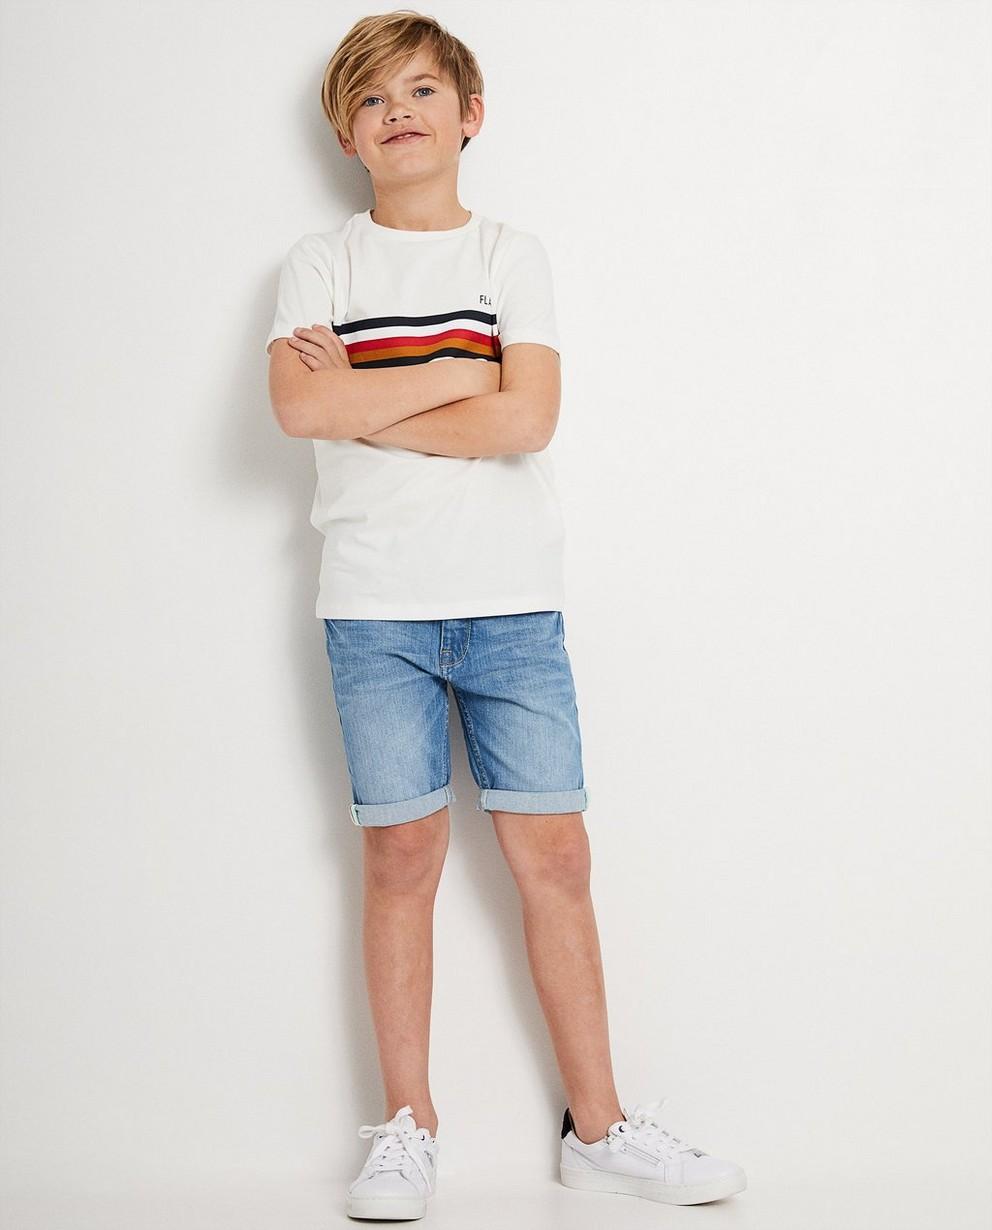 T-shirt blanc Baptiste 7-14 ans - rayures, 7-14 ans - JBC